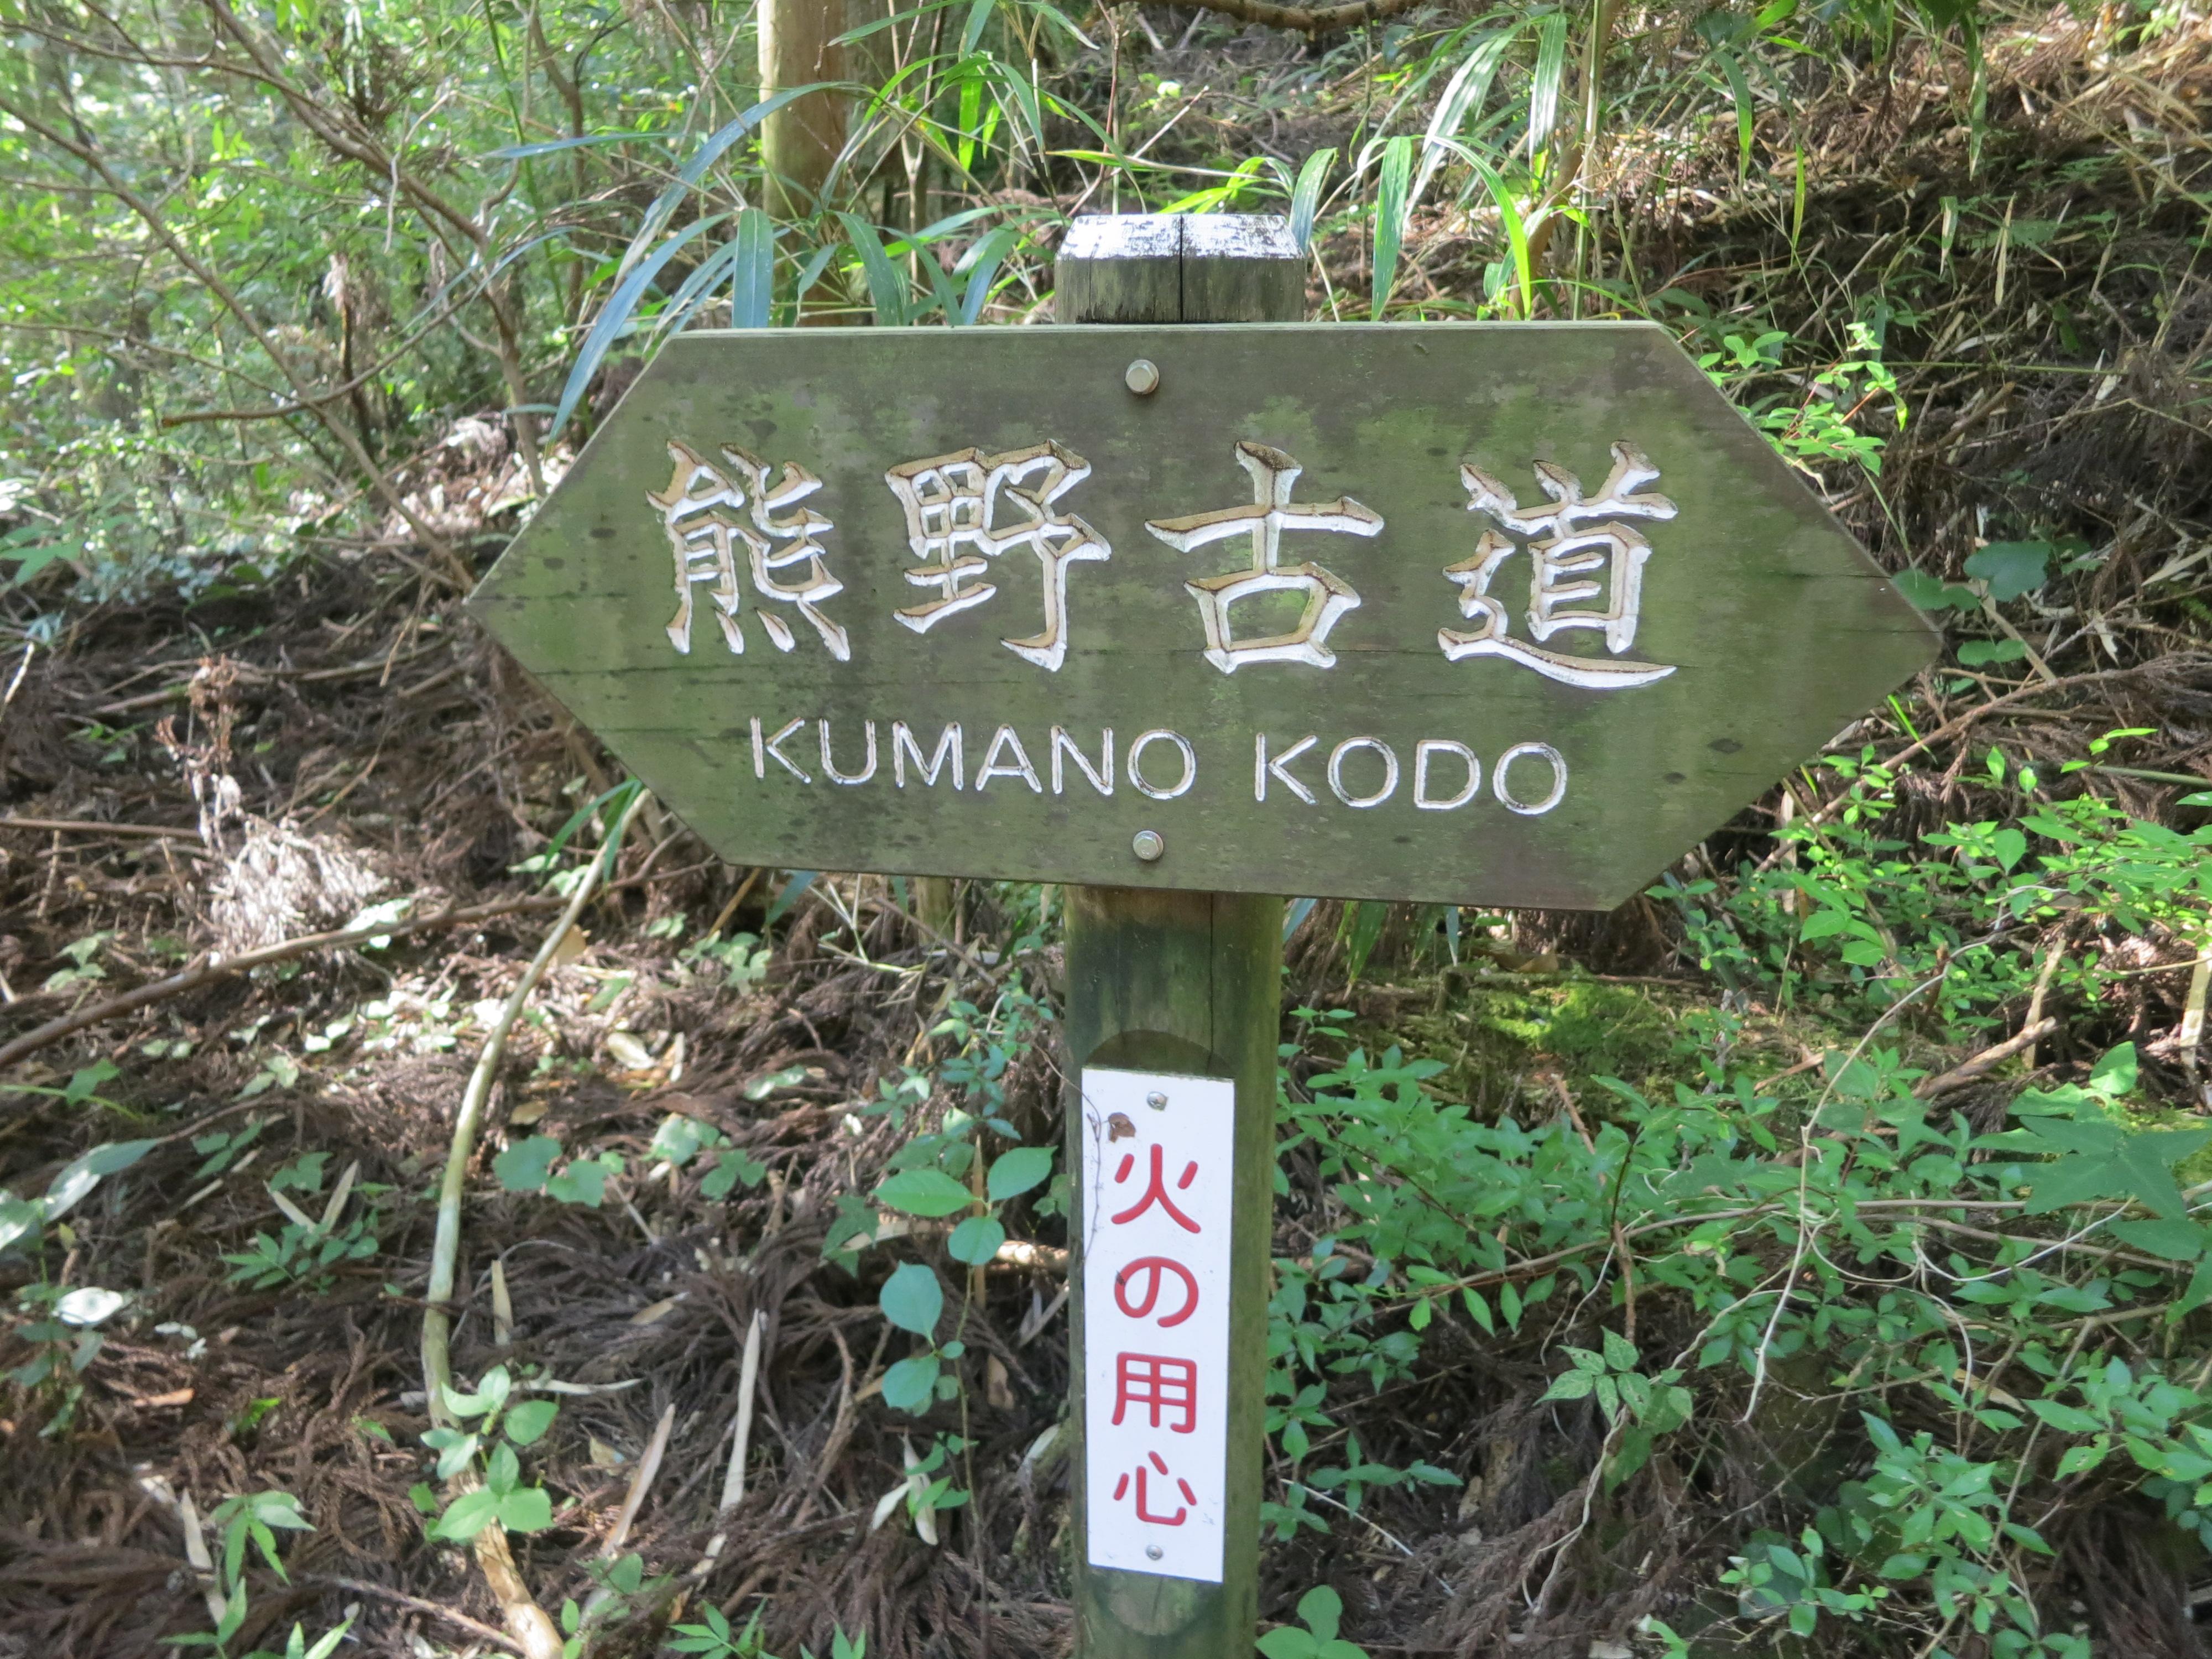 Resultado de imagen de kumano kodo 7 sign